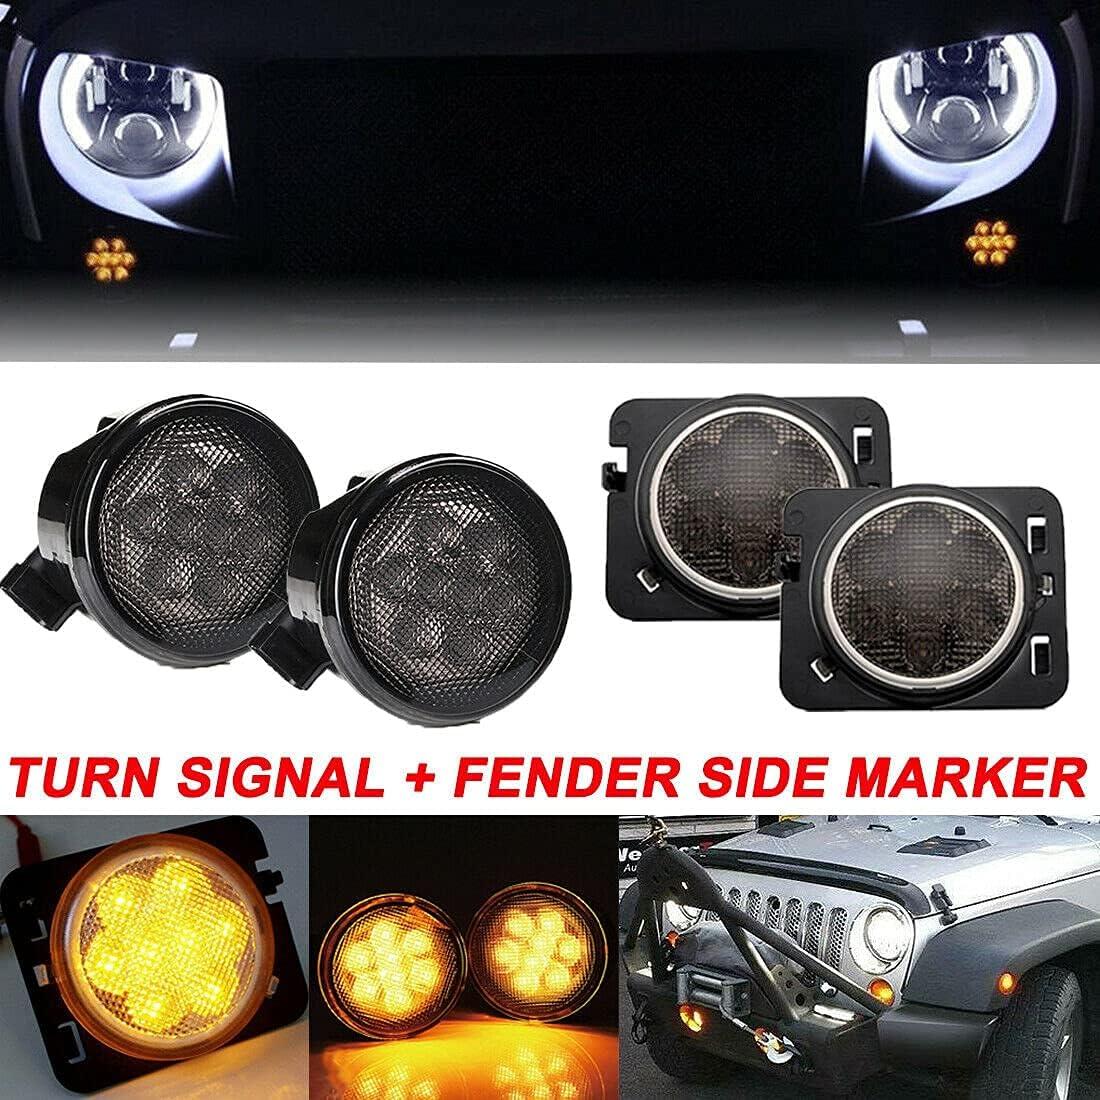 2007-2018 JK 2PCS LED Turn Signal Amber Ranking TOP4 Marke Side + High quality Lights